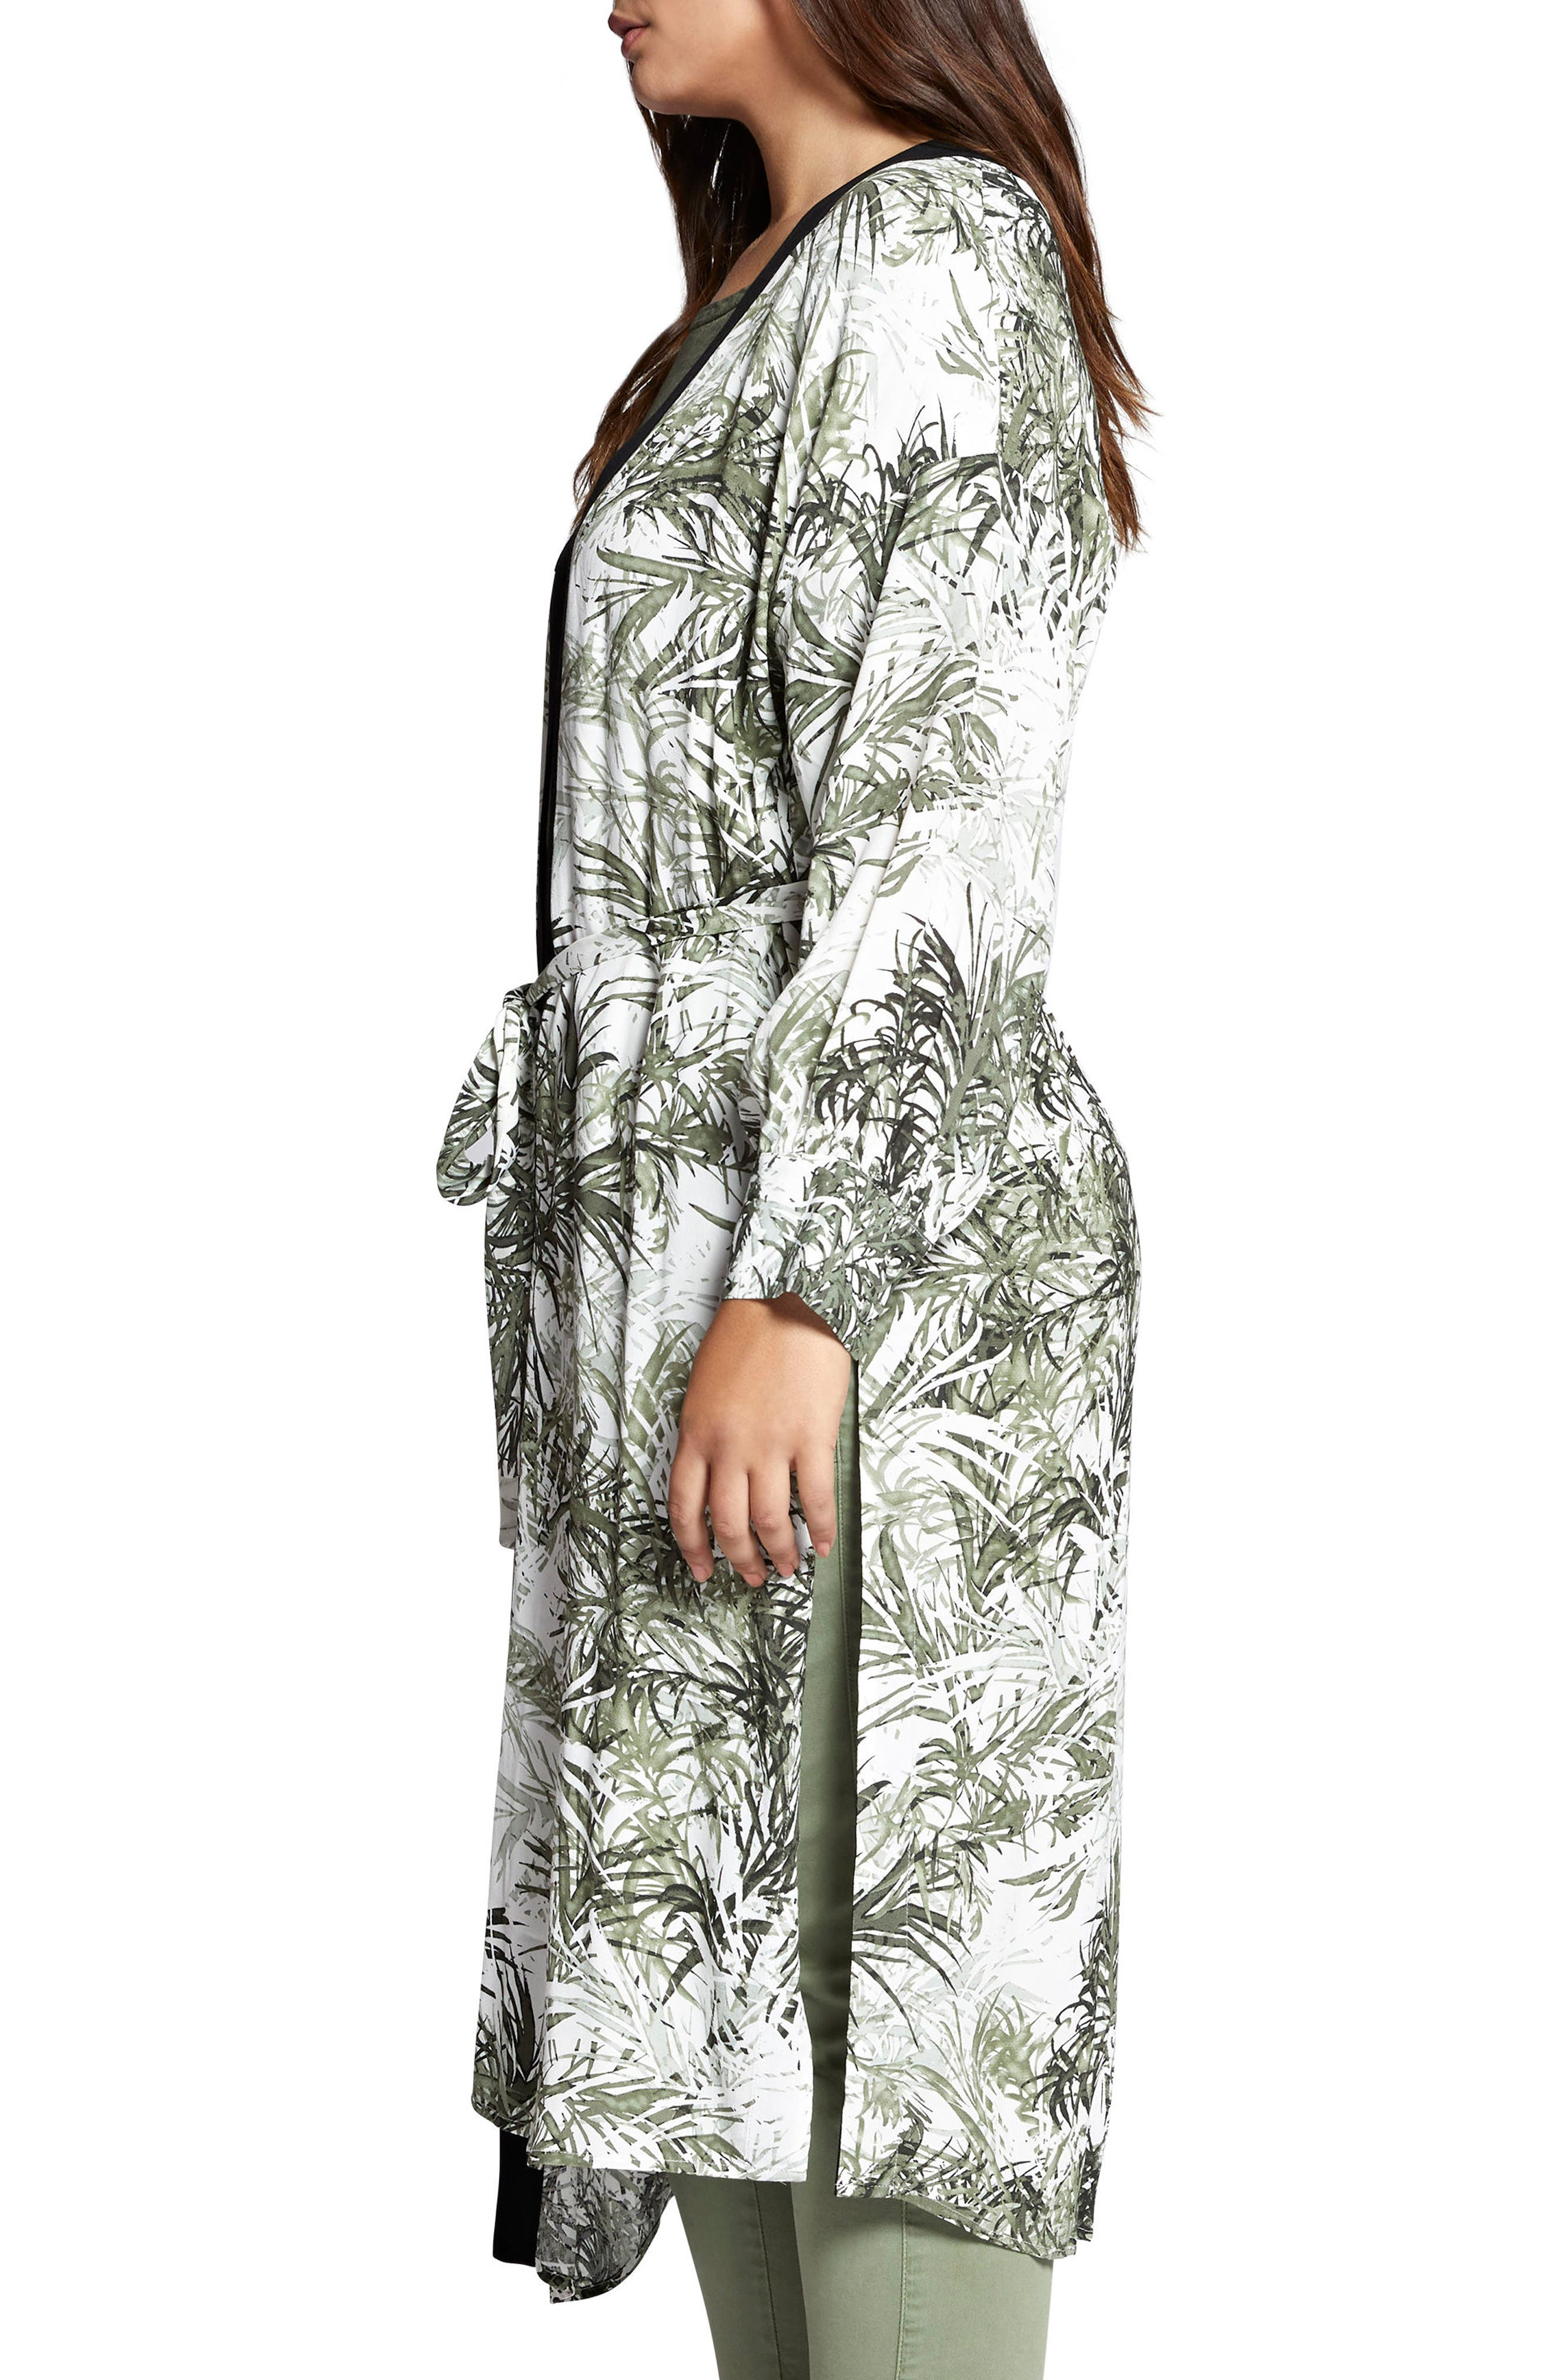 Calico Kimono,                             Alternate thumbnail 10, color,                             306